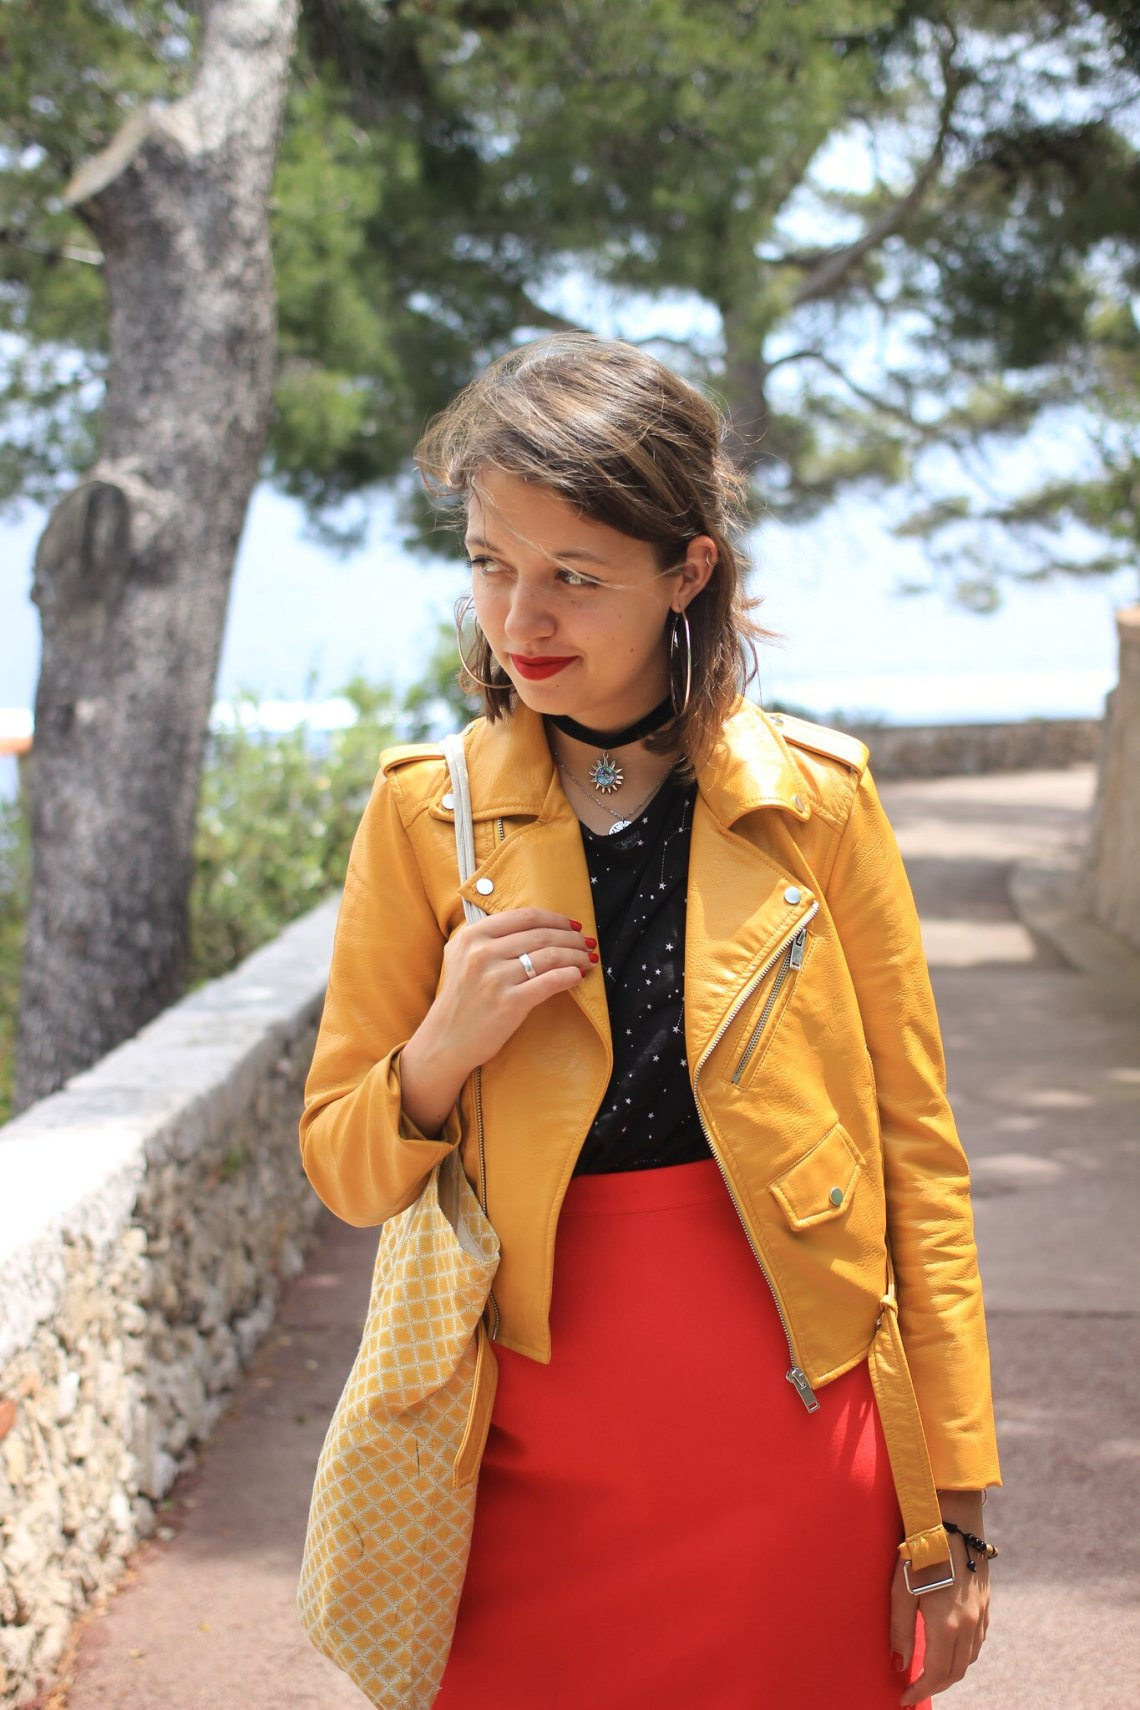 7-tenue-jaune-rouge-collier-ras-de-cou